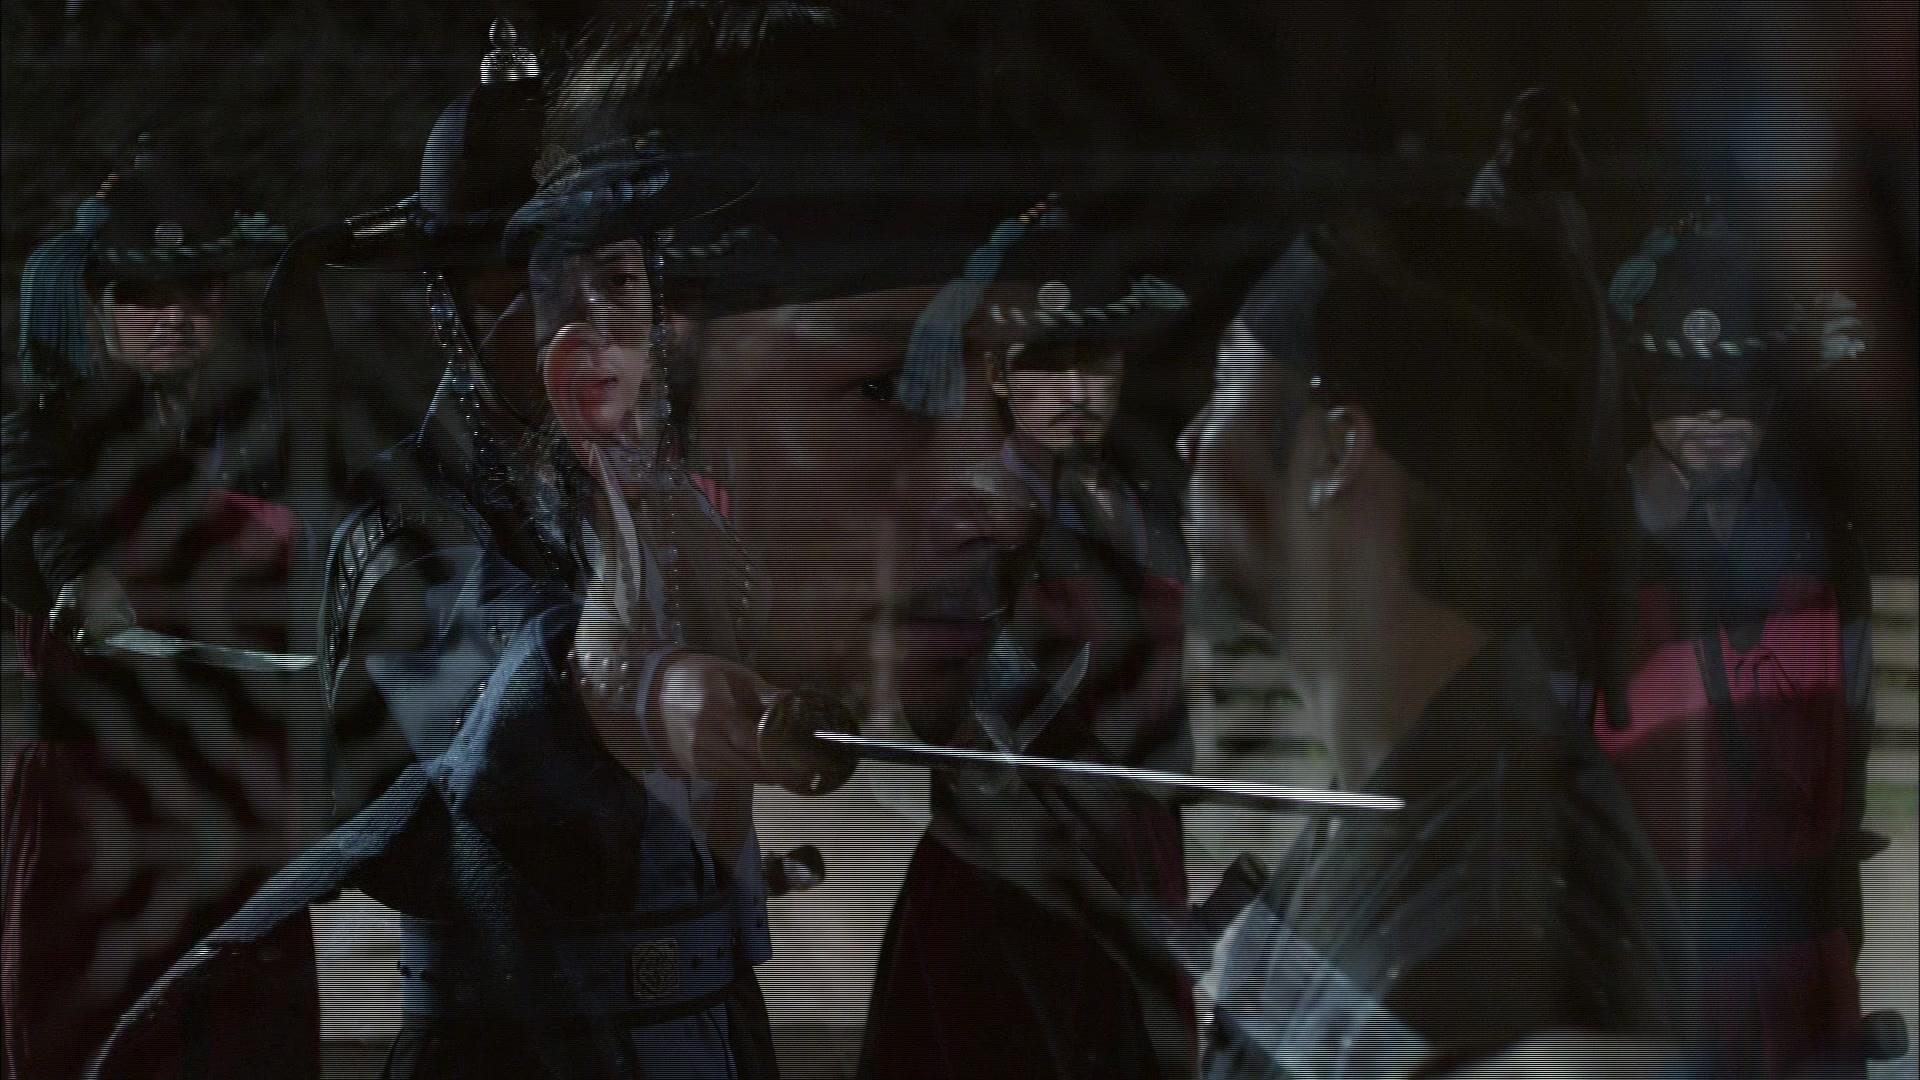 Gunman in Joseon Episode 7